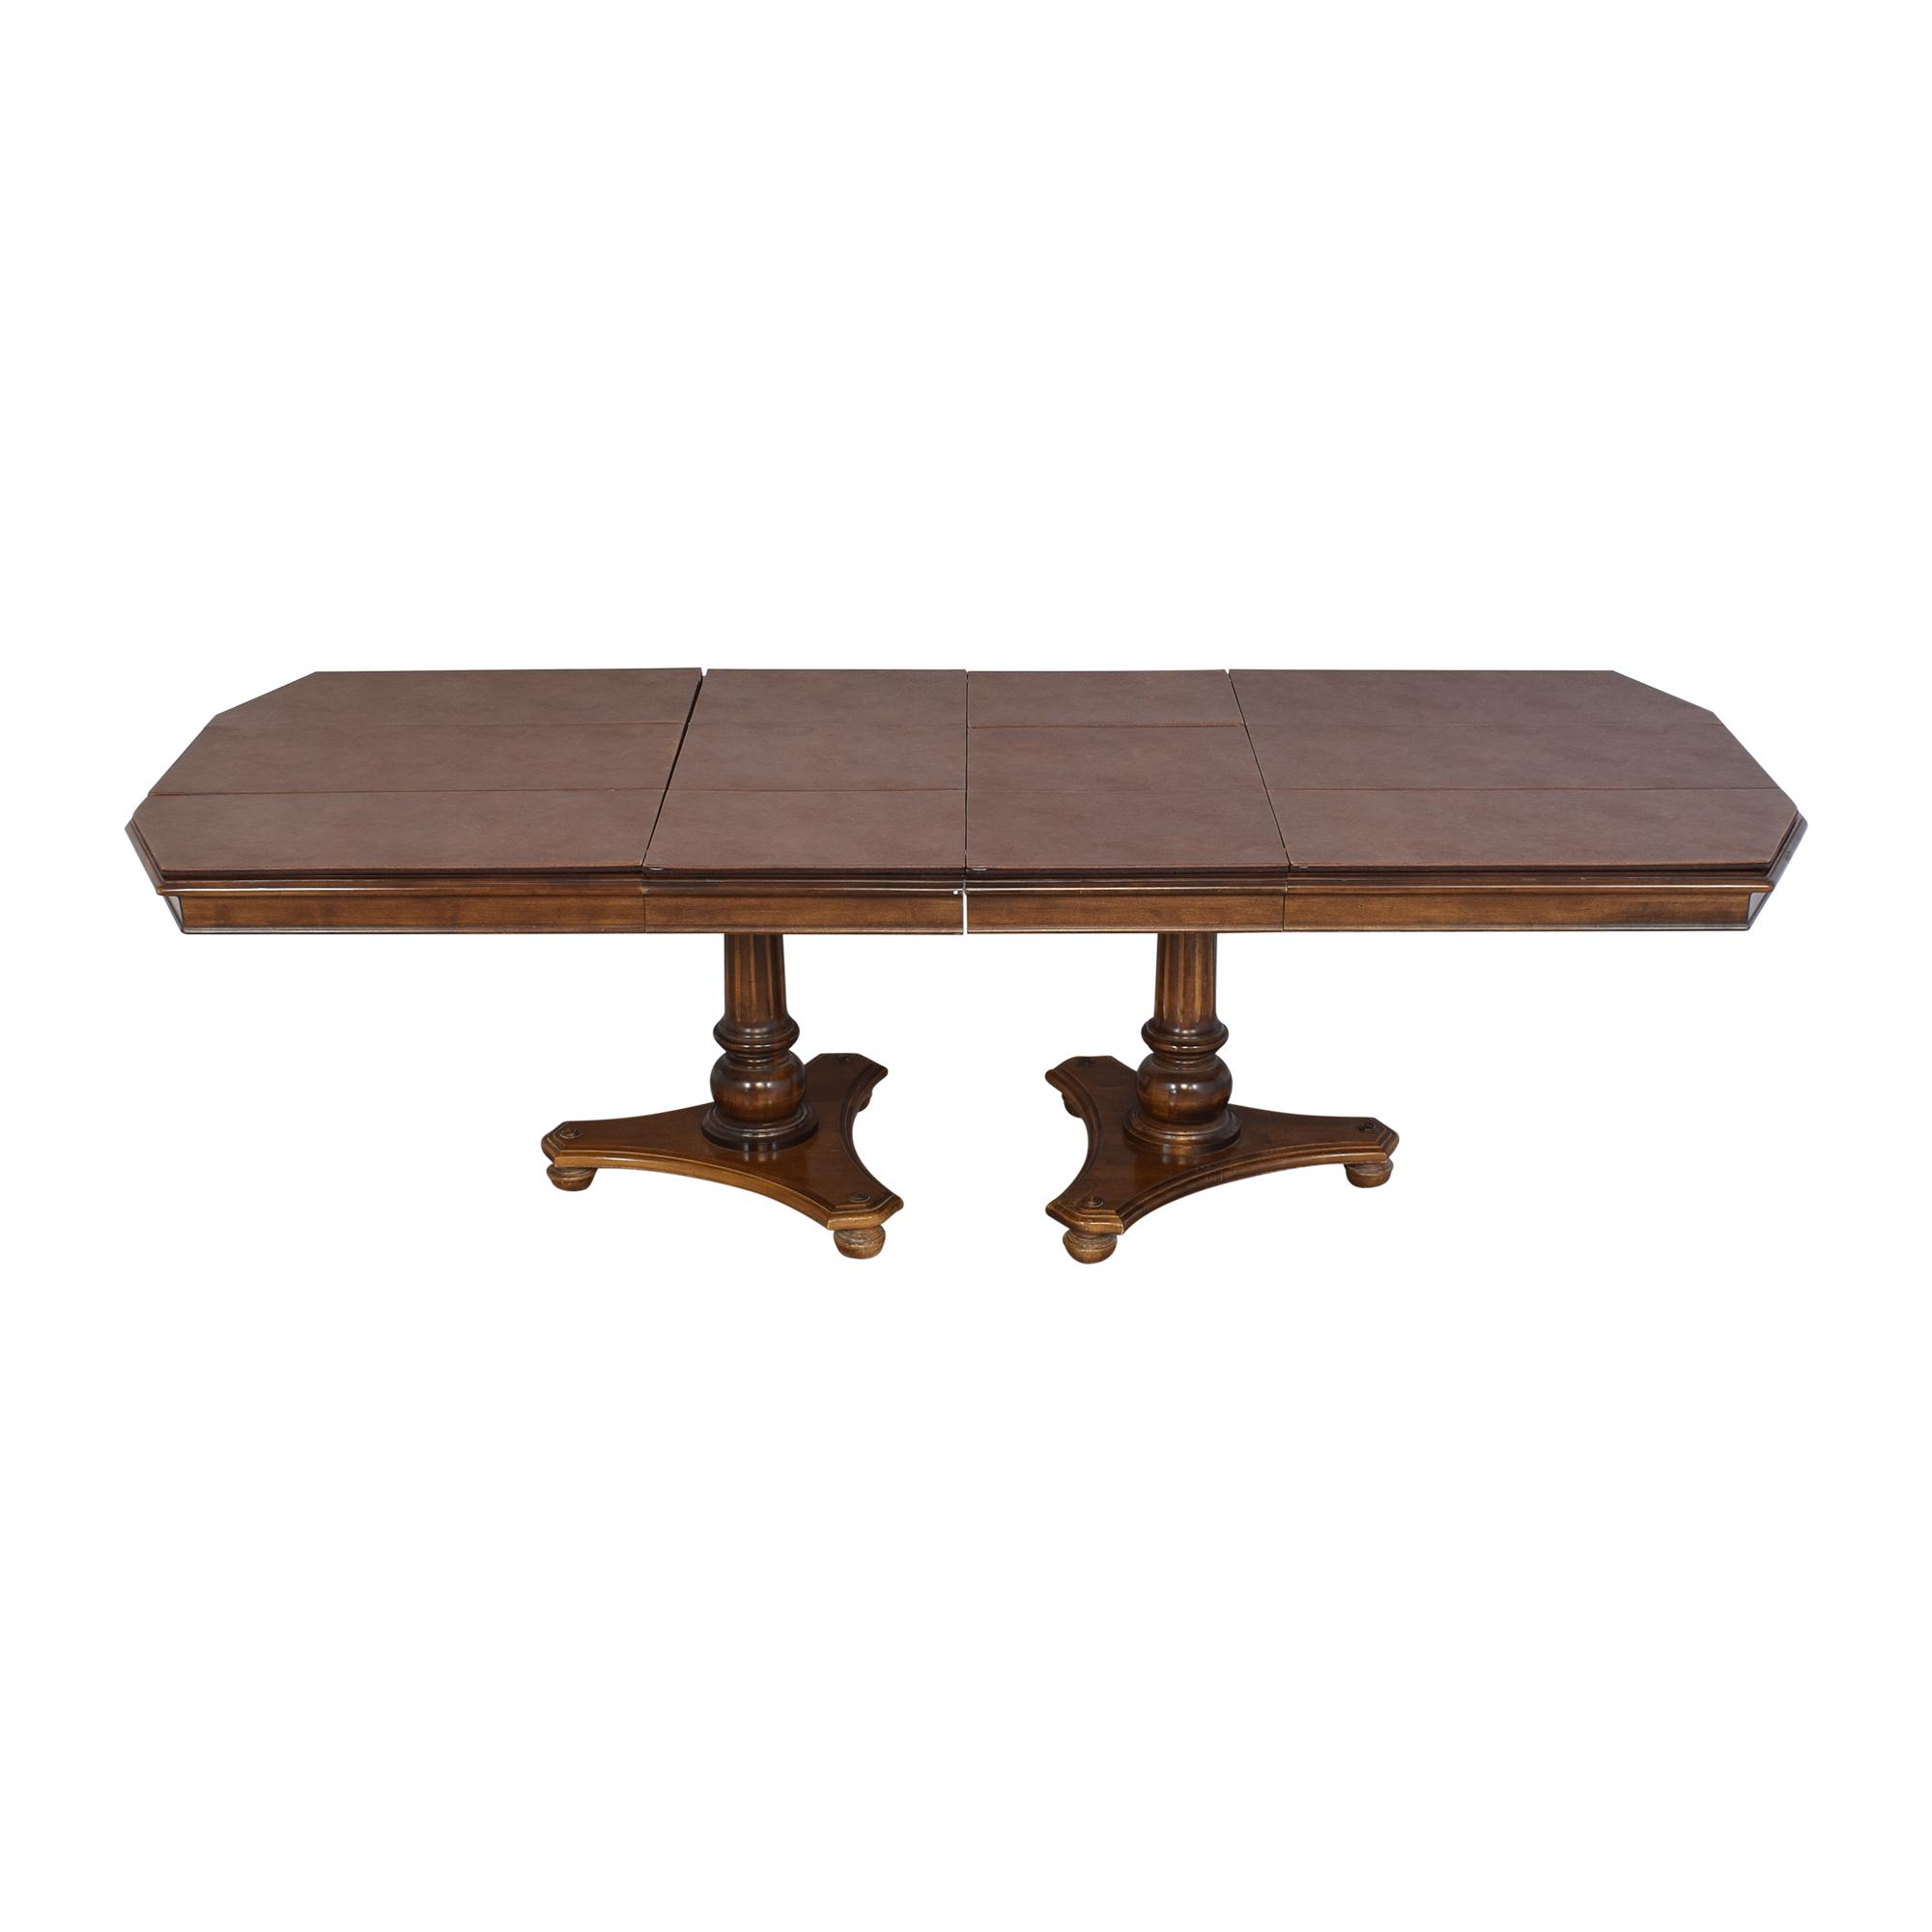 Ethan Allen Ethan Allen Extendable Double Pedestal Dining Table on sale